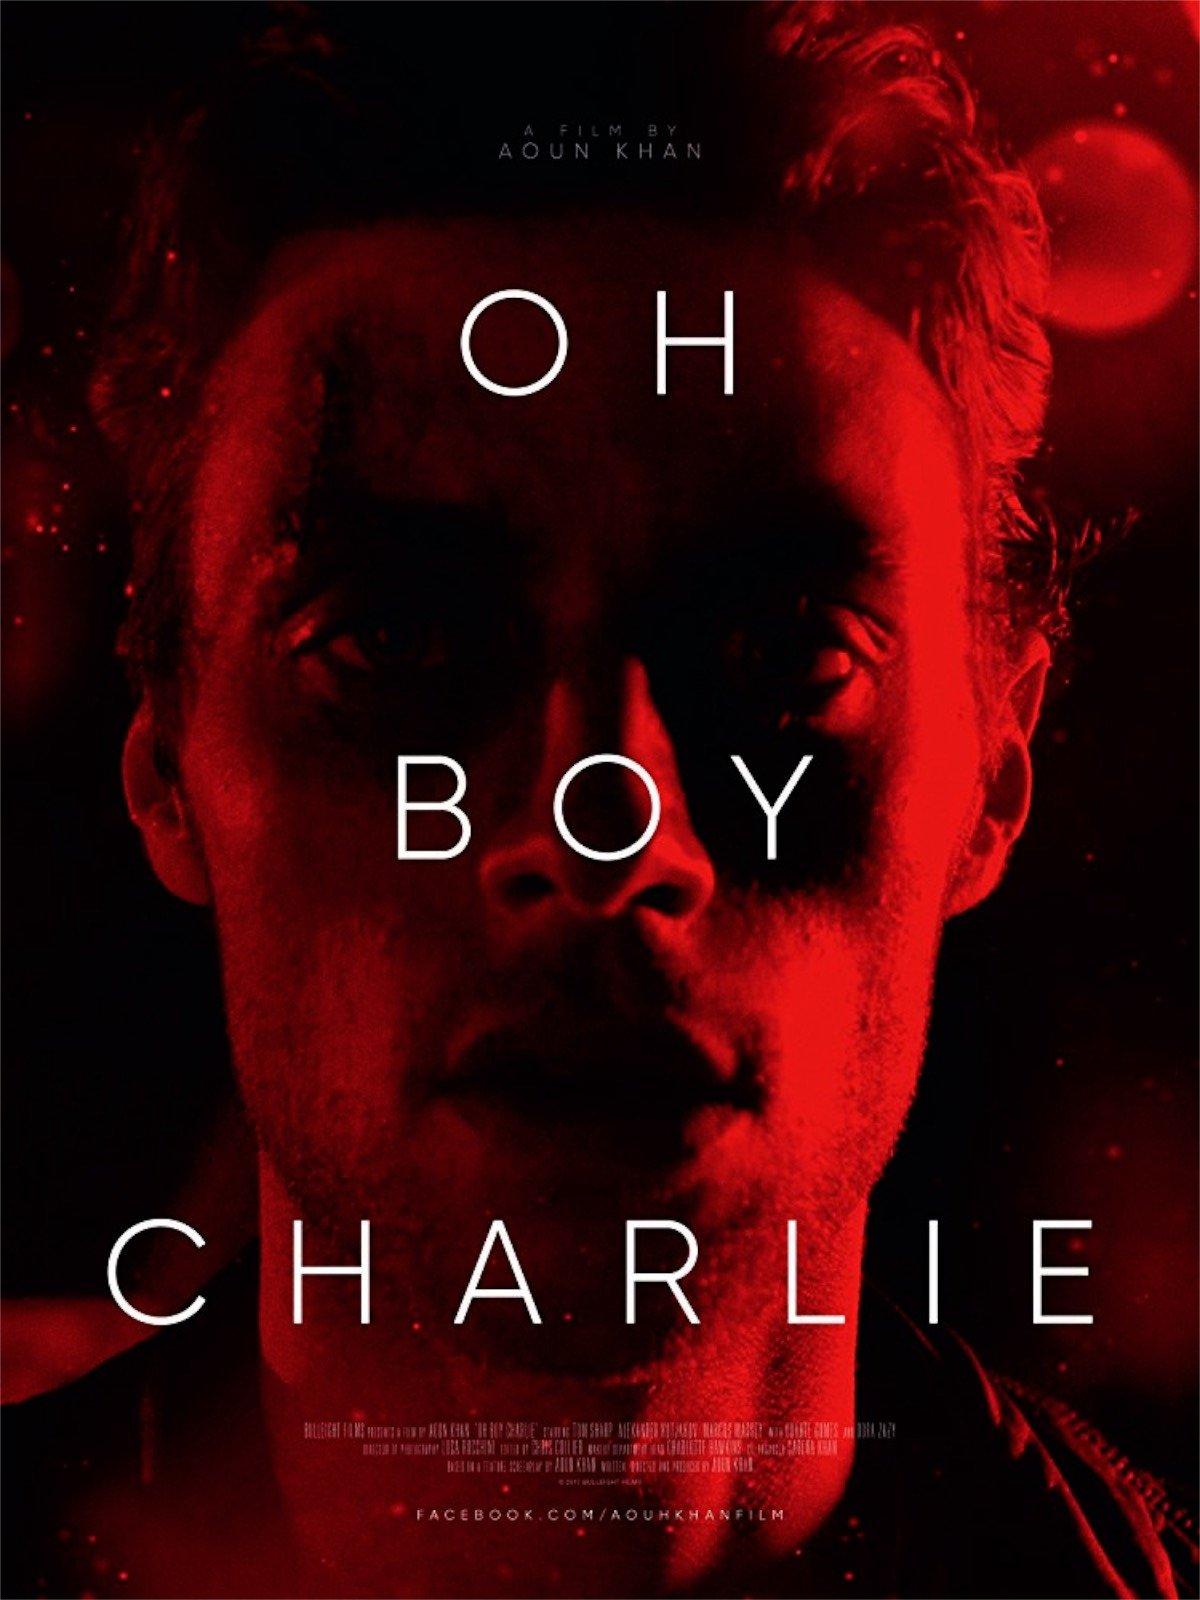 Oh Boy Charlie